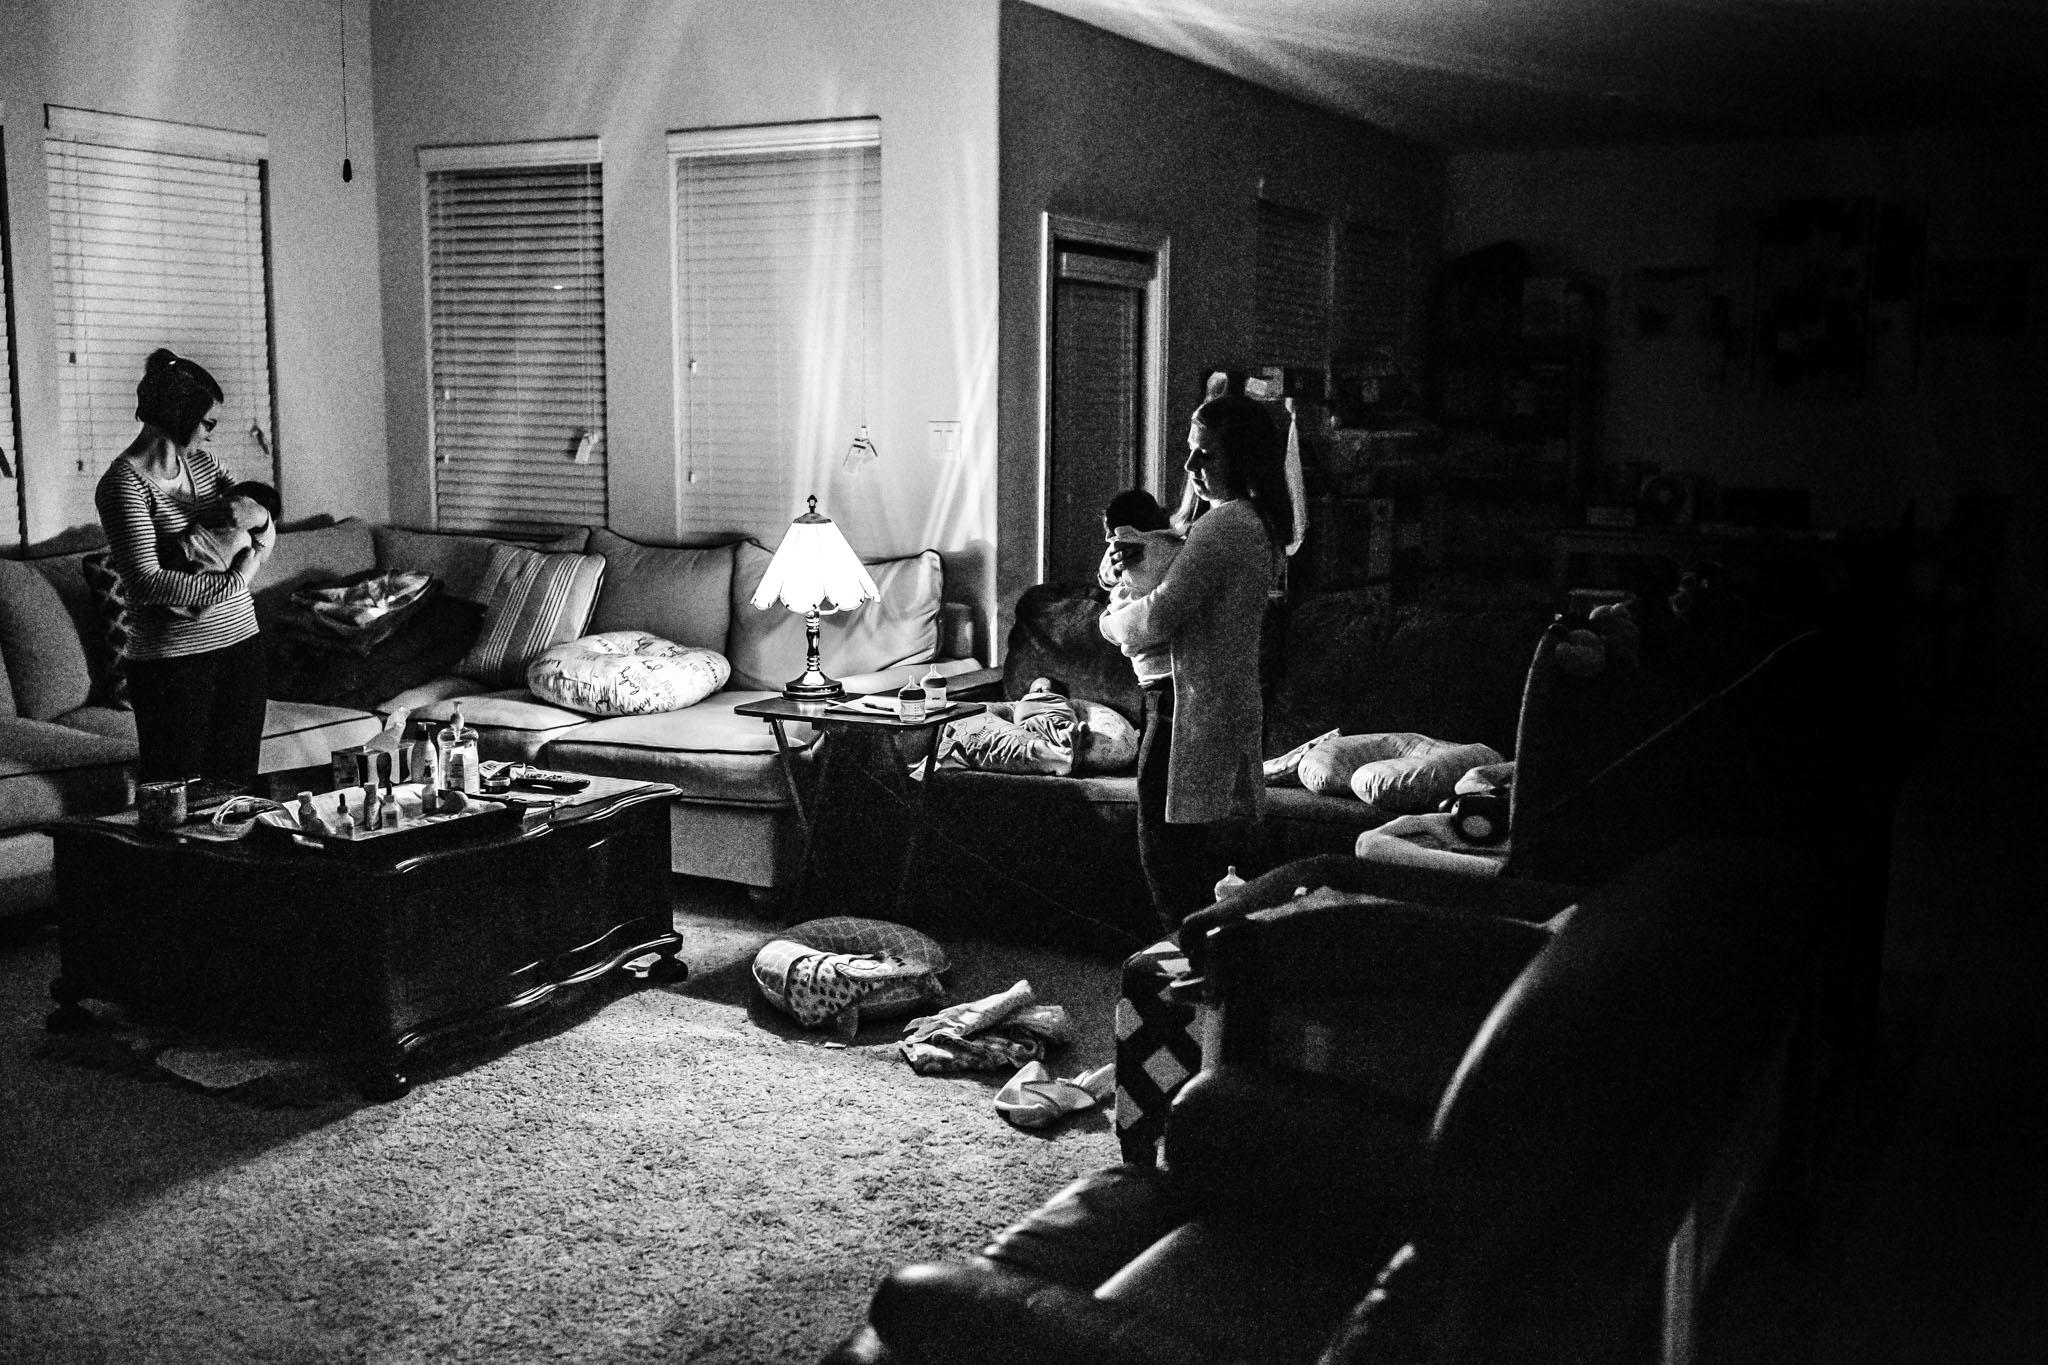 The_Night_in_the_life_ofa_postpartum_doula_KEDocumentary_Dallas11.jpg